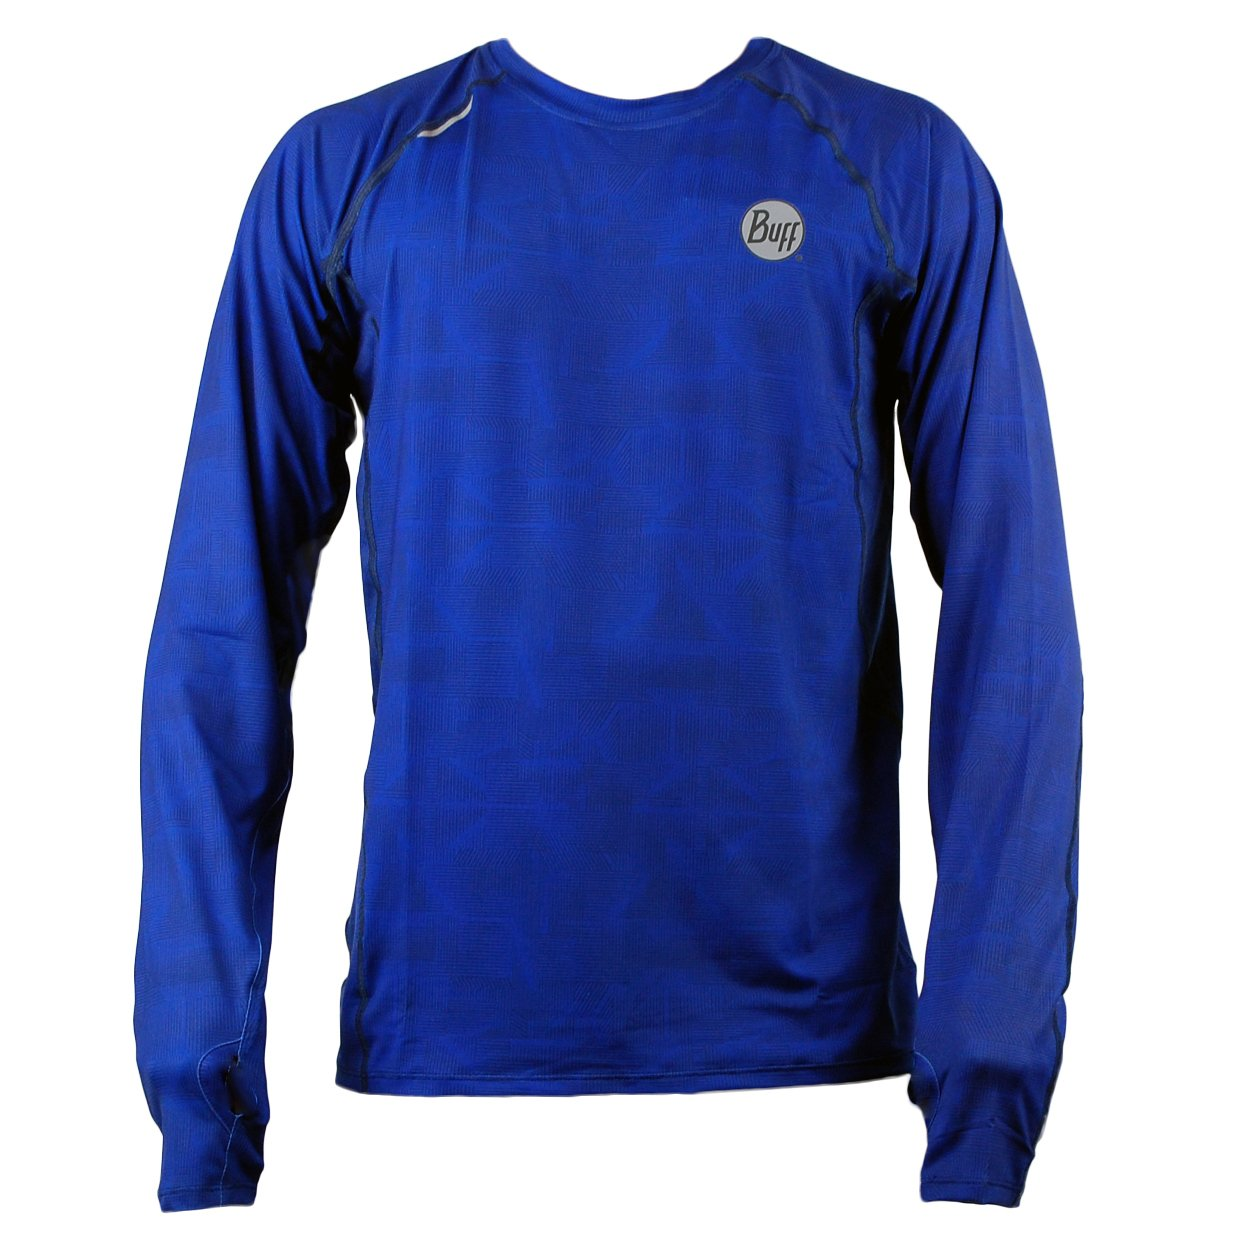 Buff Herren T-Shirt Bell - Farbe Blau